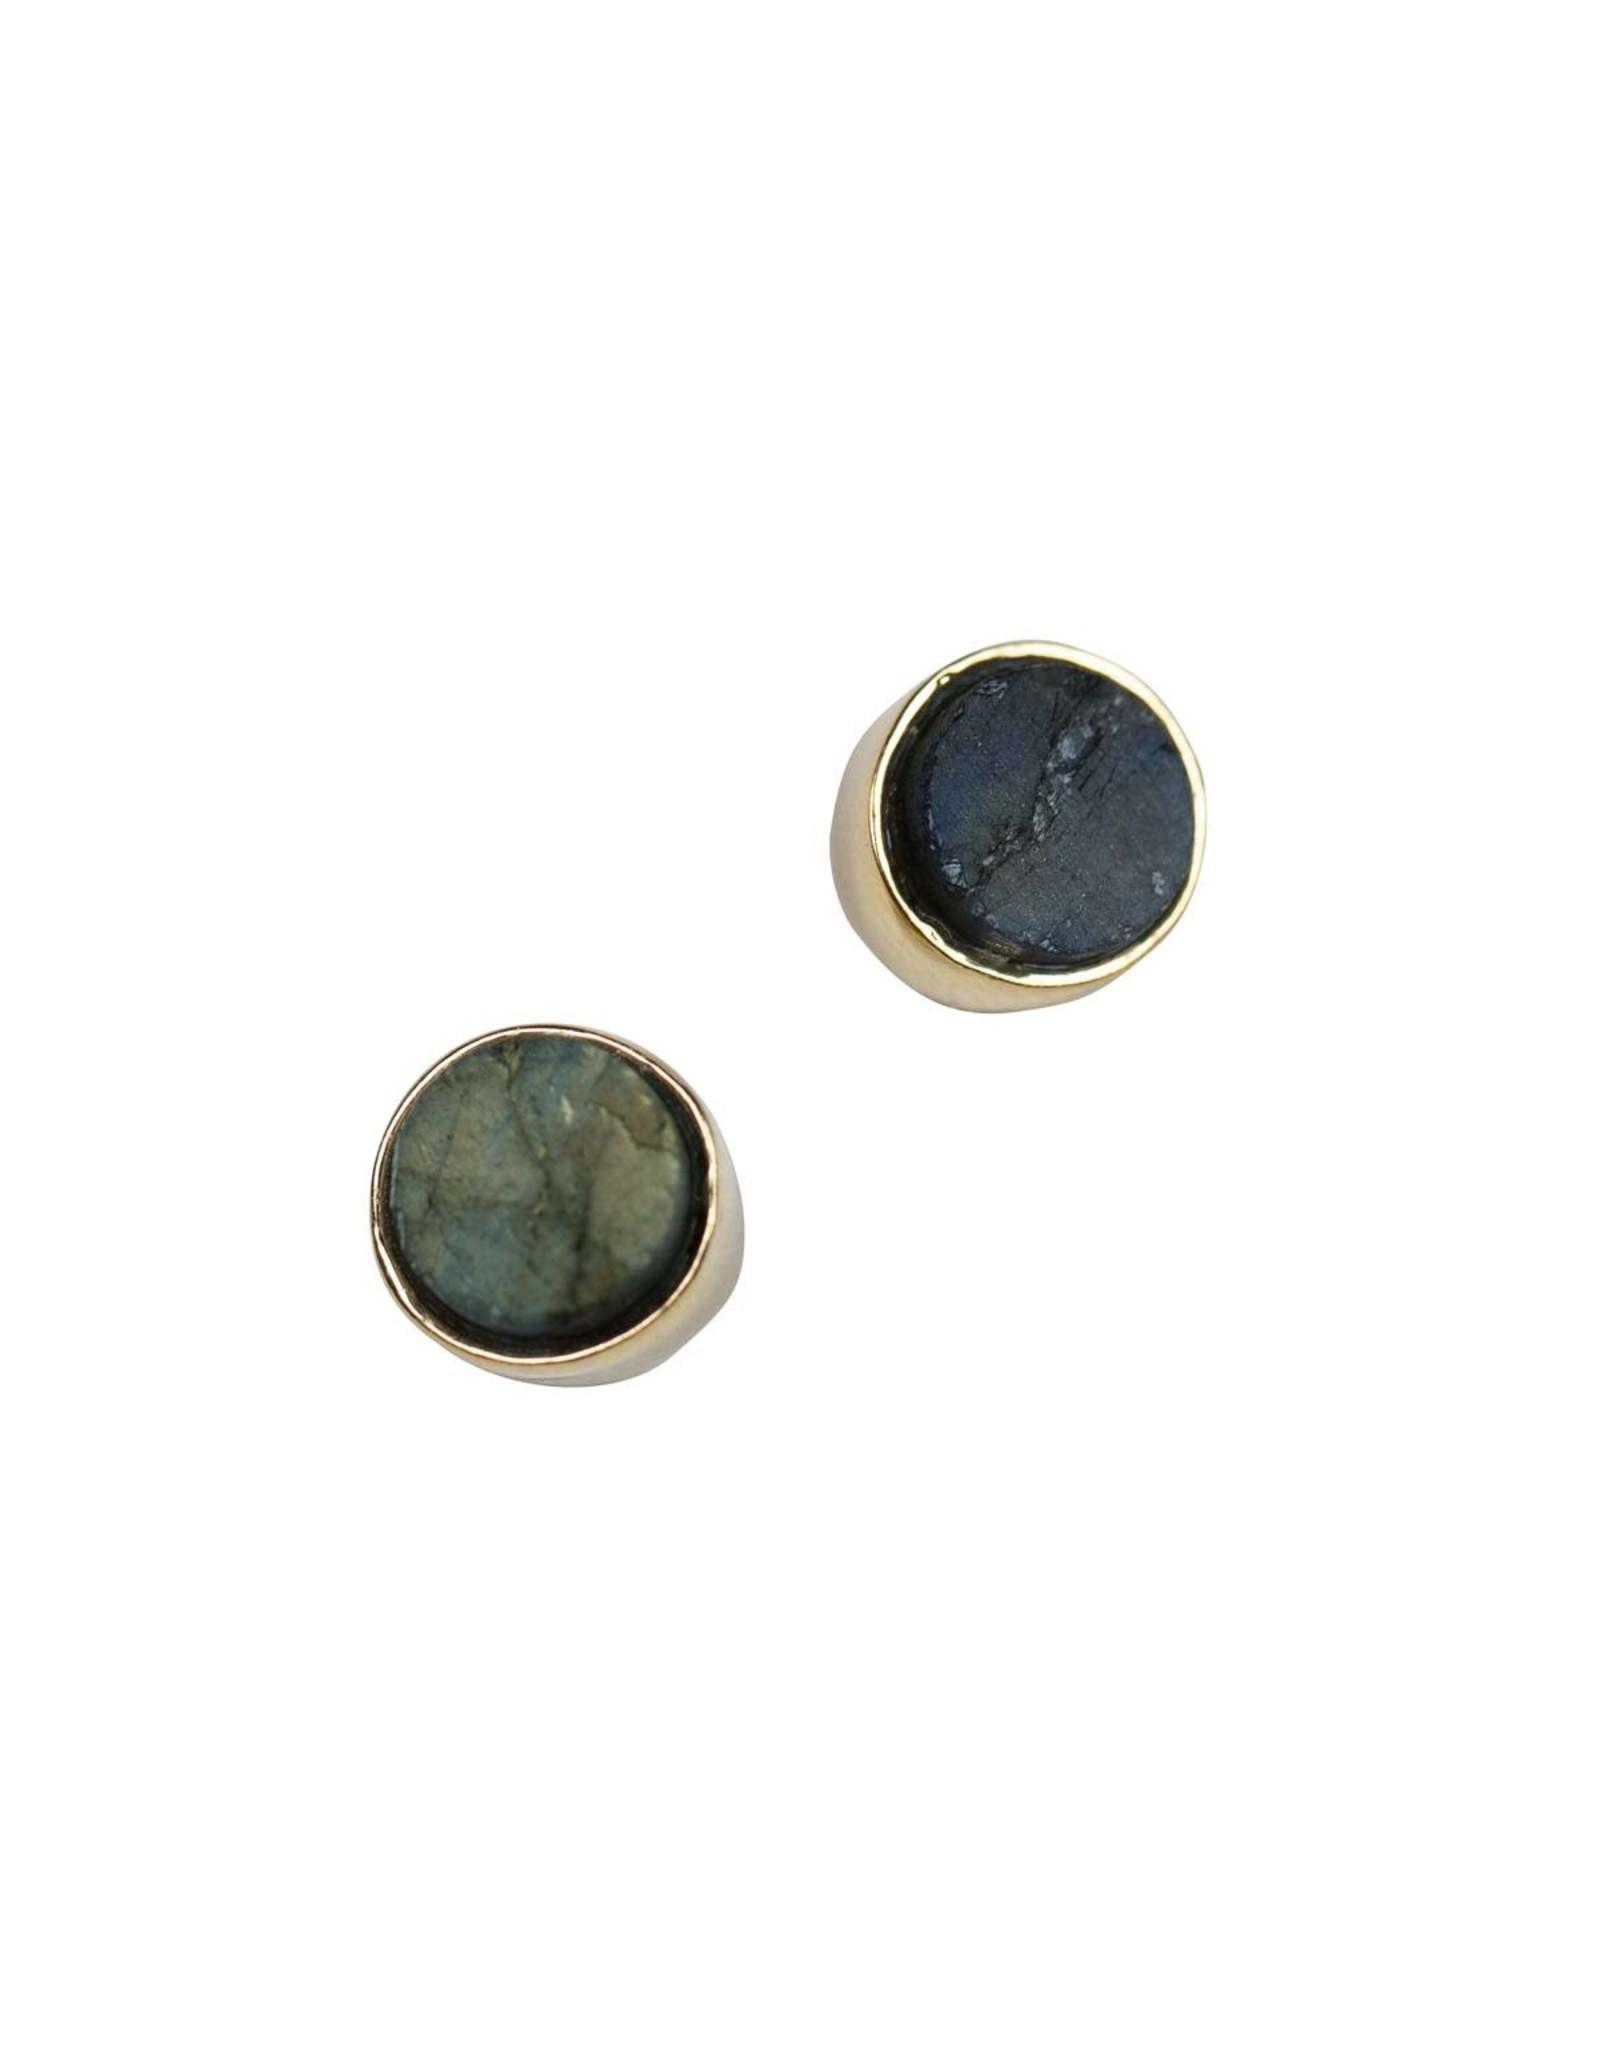 TTV USA Rough-cut Labradorite Post Earrings, India